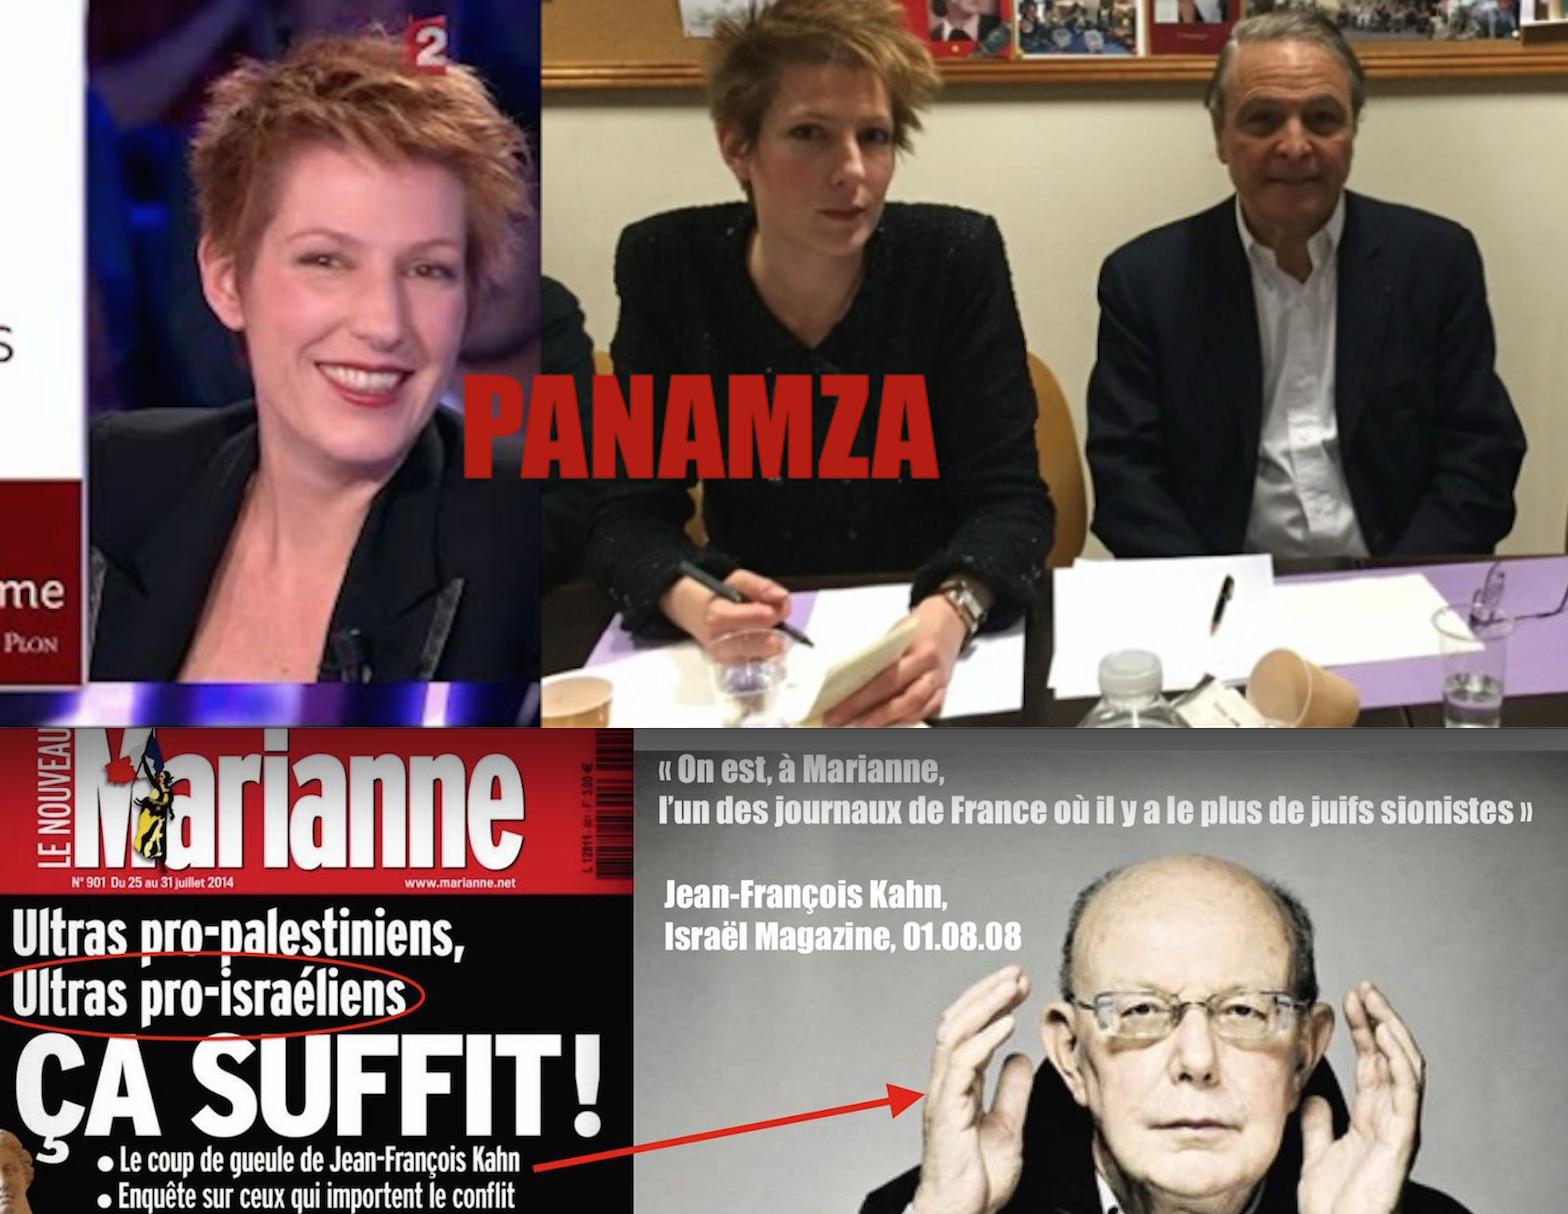 Natacha Polony, Marianne du Crif